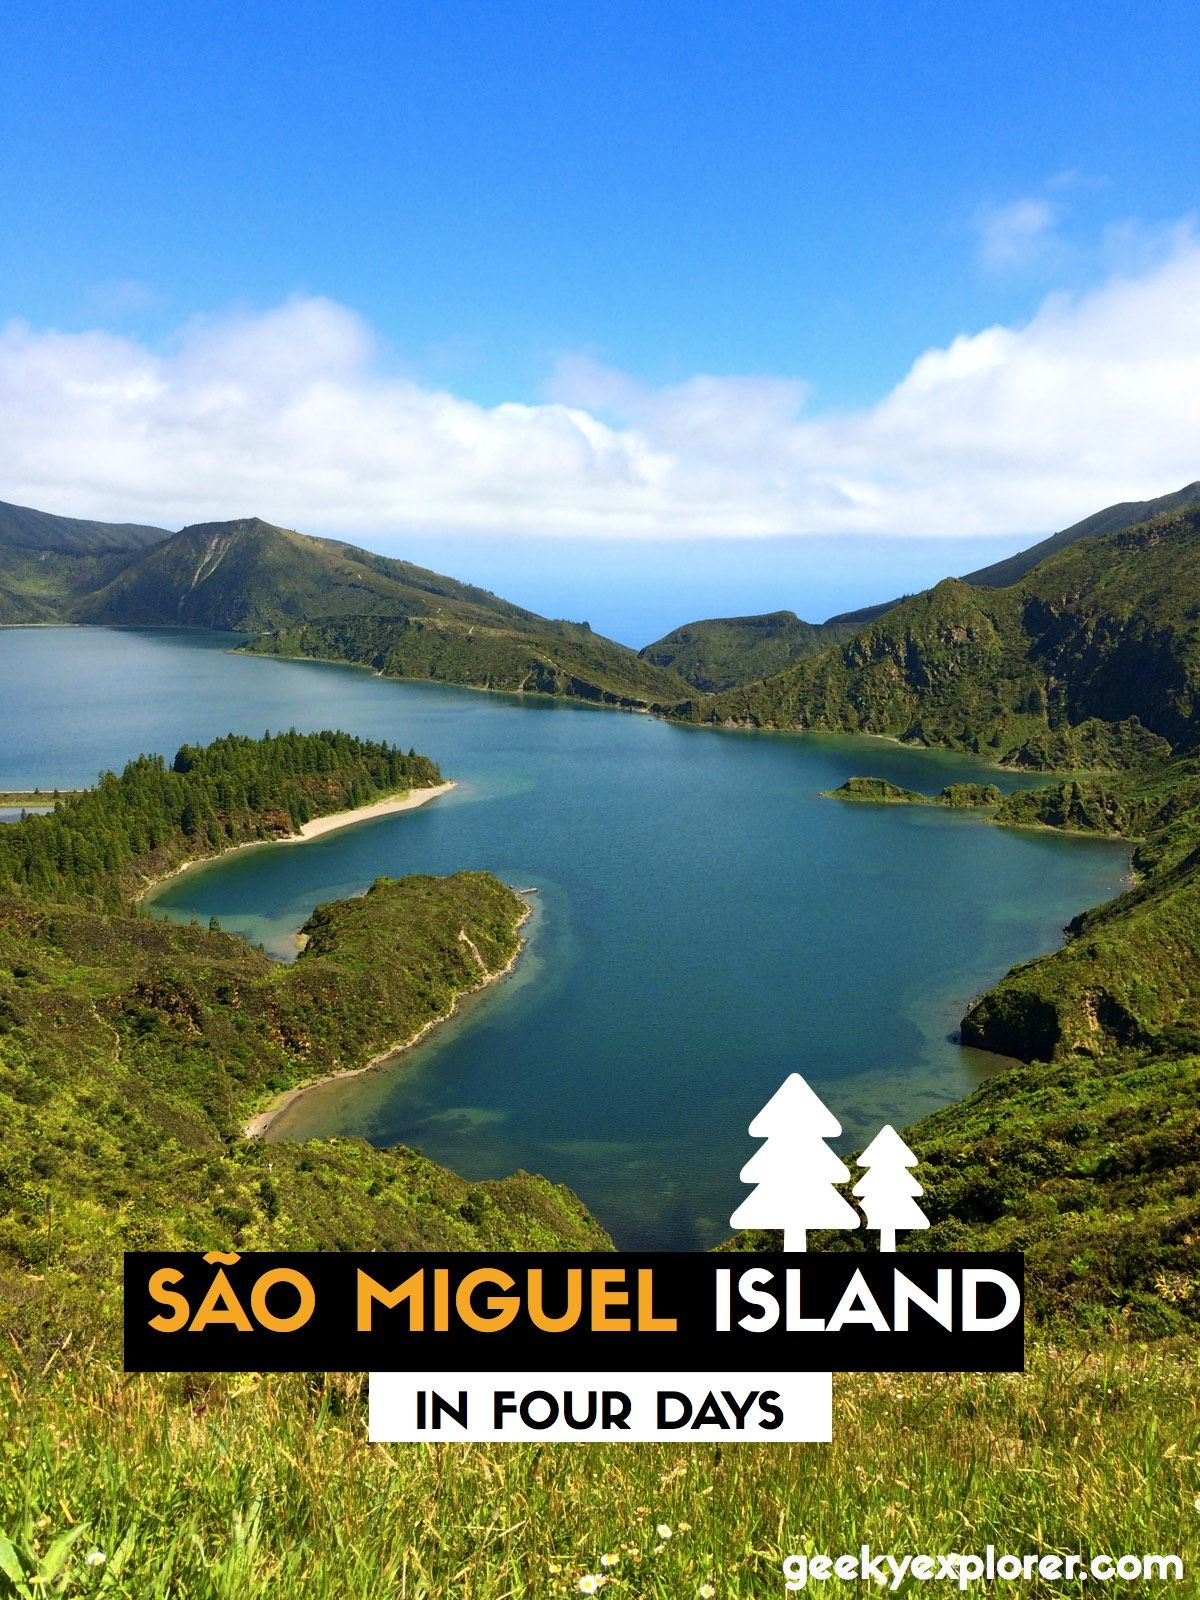 Exploring the unspoiled nature of São Miguel, Azores. #azores #portugal #acores #nature #islands #traveltips @visitportugal @visitingazores